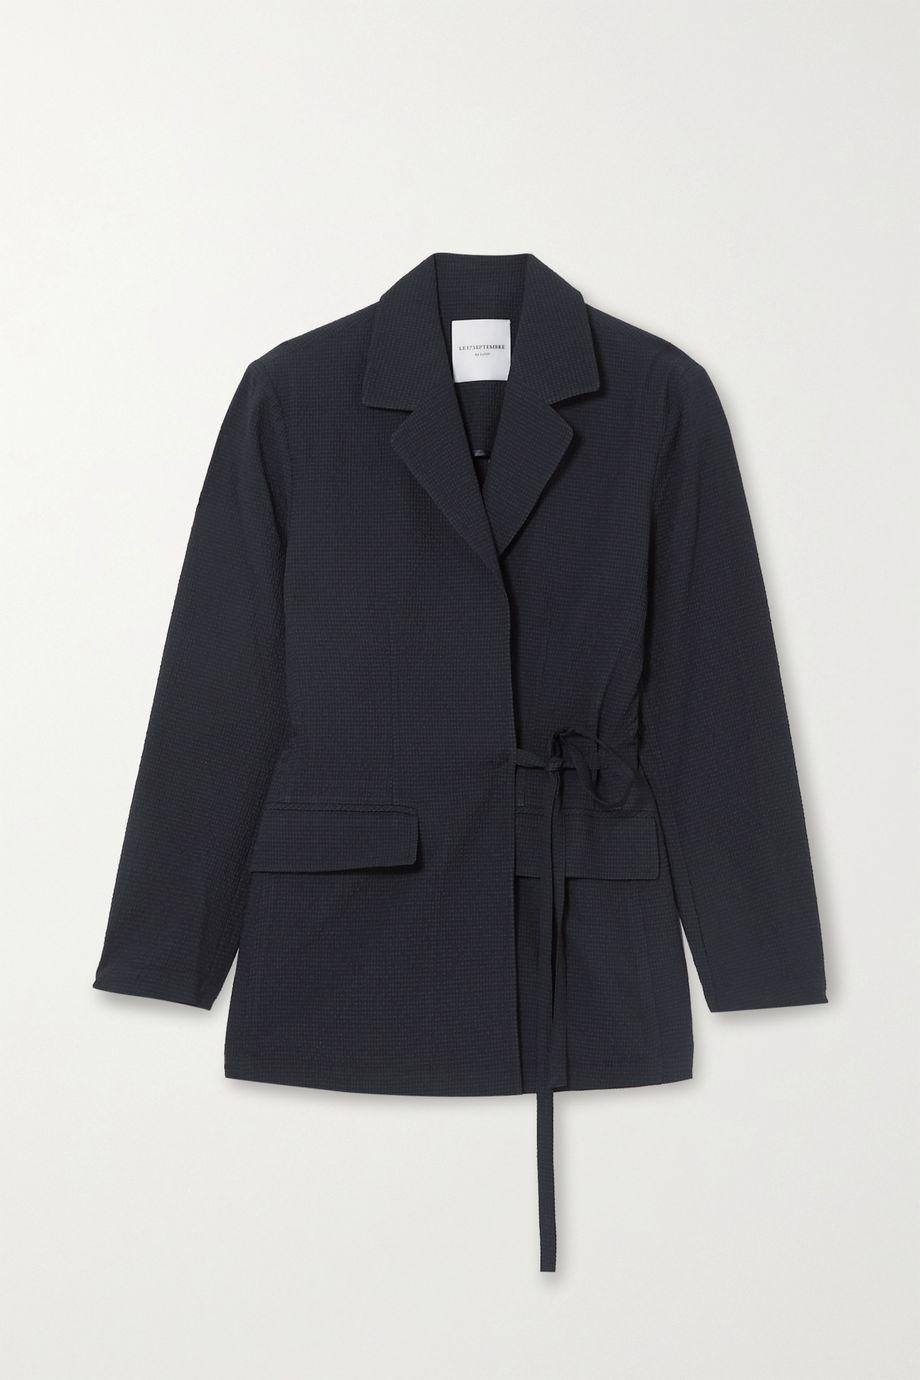 LE 17 SEPTEMBRE Tie-detailed seersucker blazer